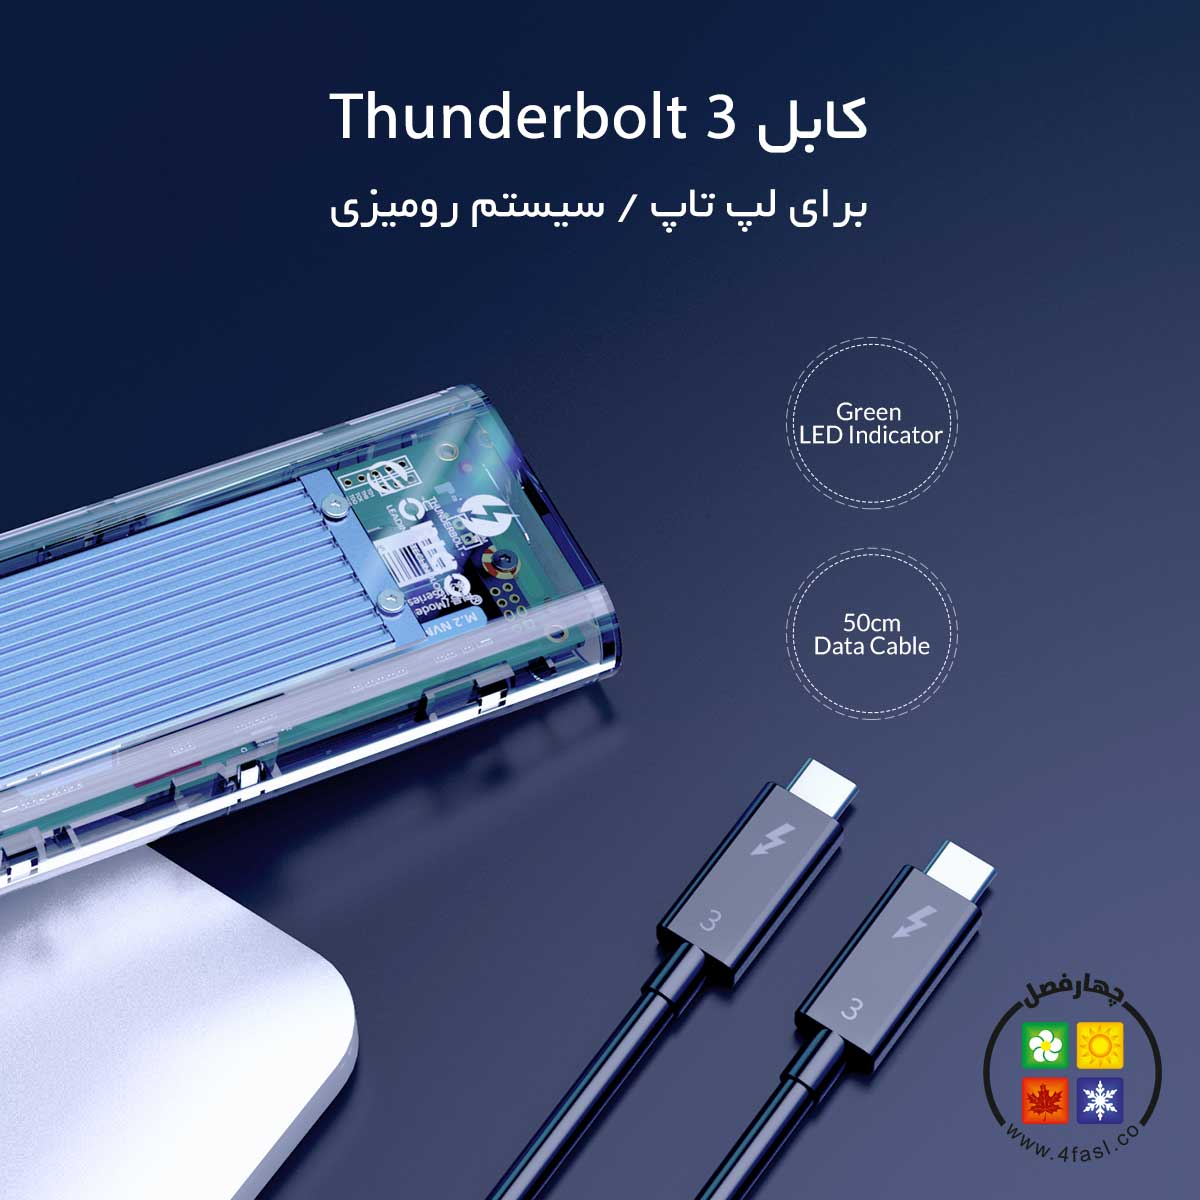 باکس اس اس دی Thunderbolt 3